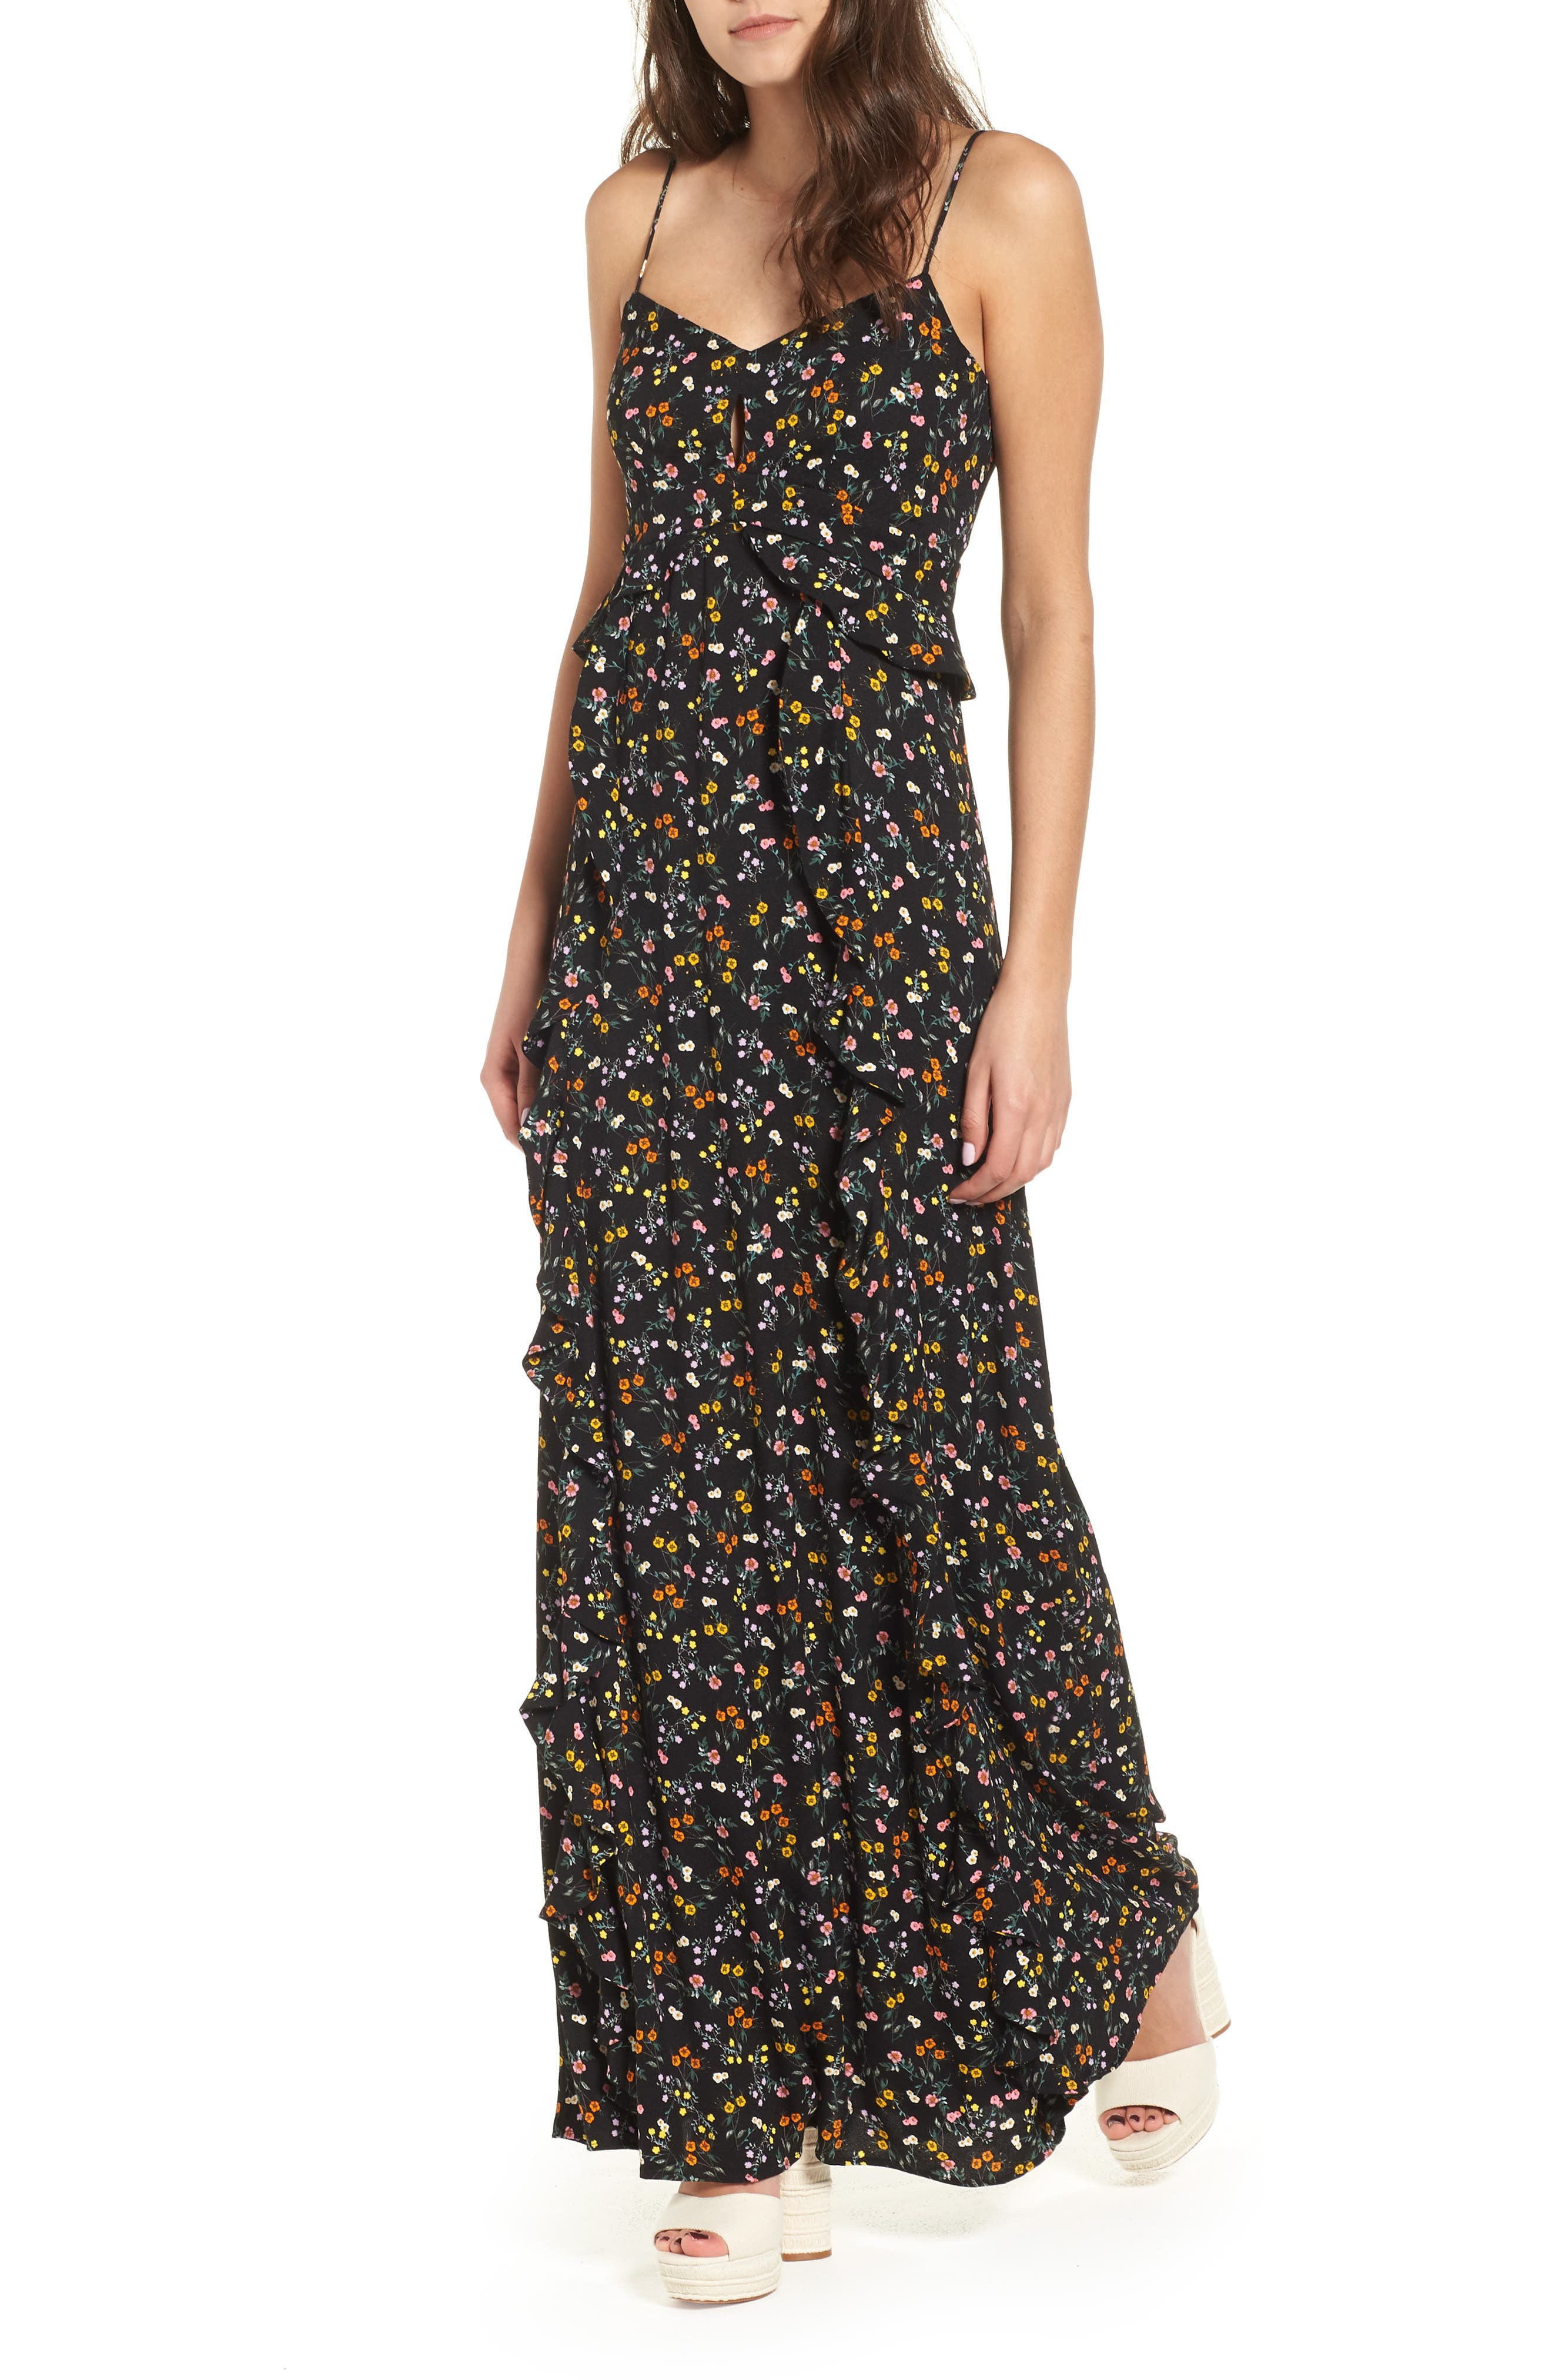 Kiki Ruffle Maxi Dress,                             Main thumbnail 1, color,                             Noir Petite Fleur